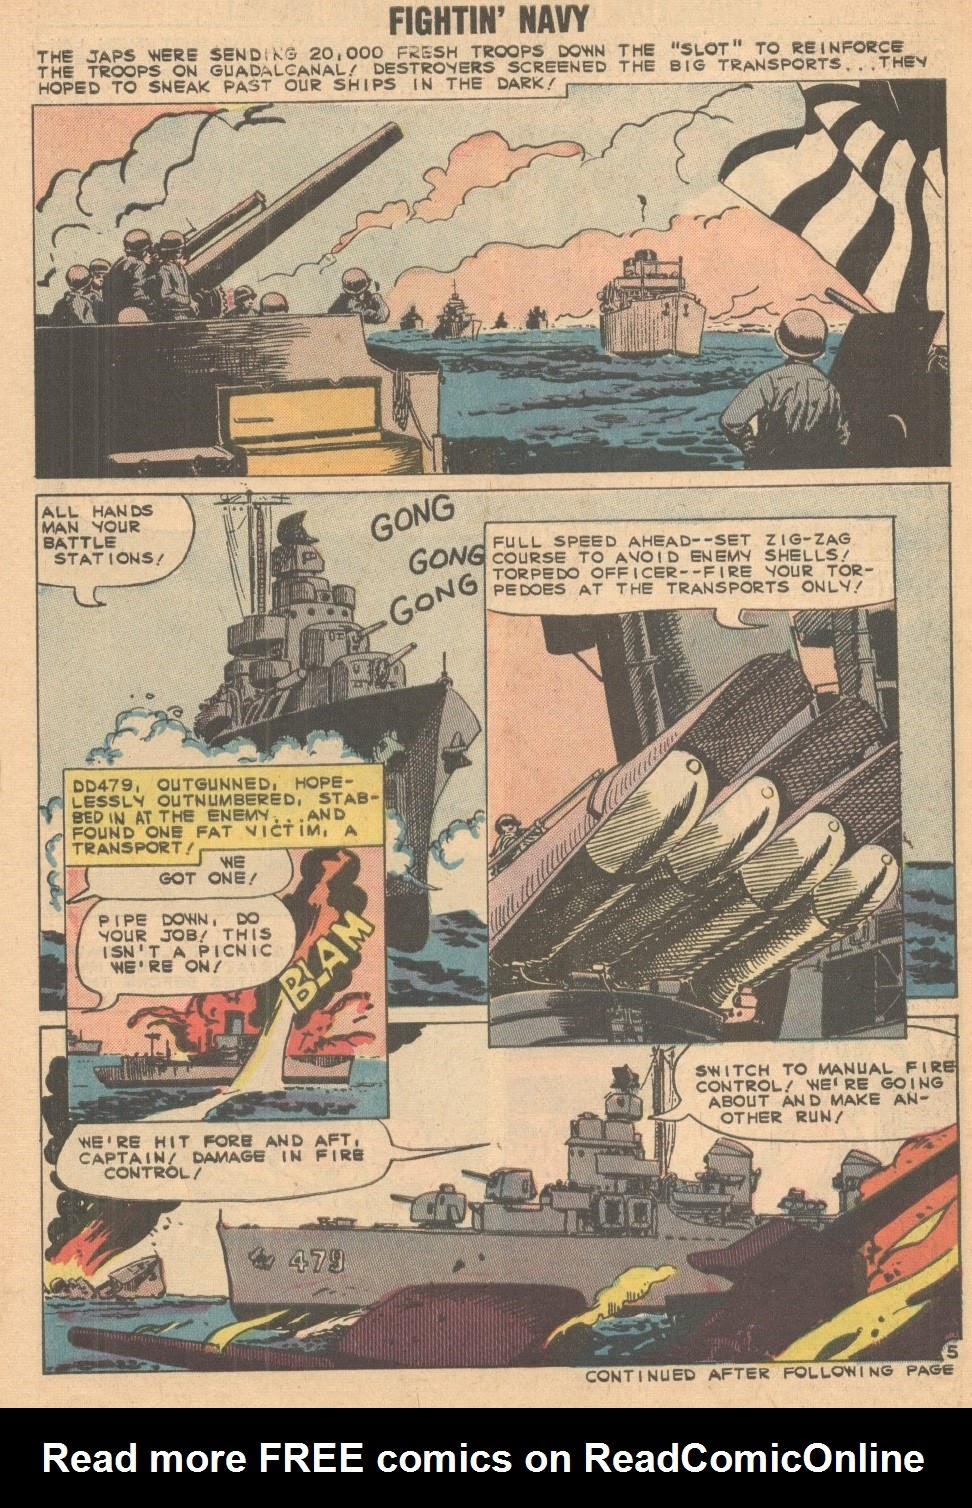 Read online Fightin' Navy comic -  Issue #93 - 30